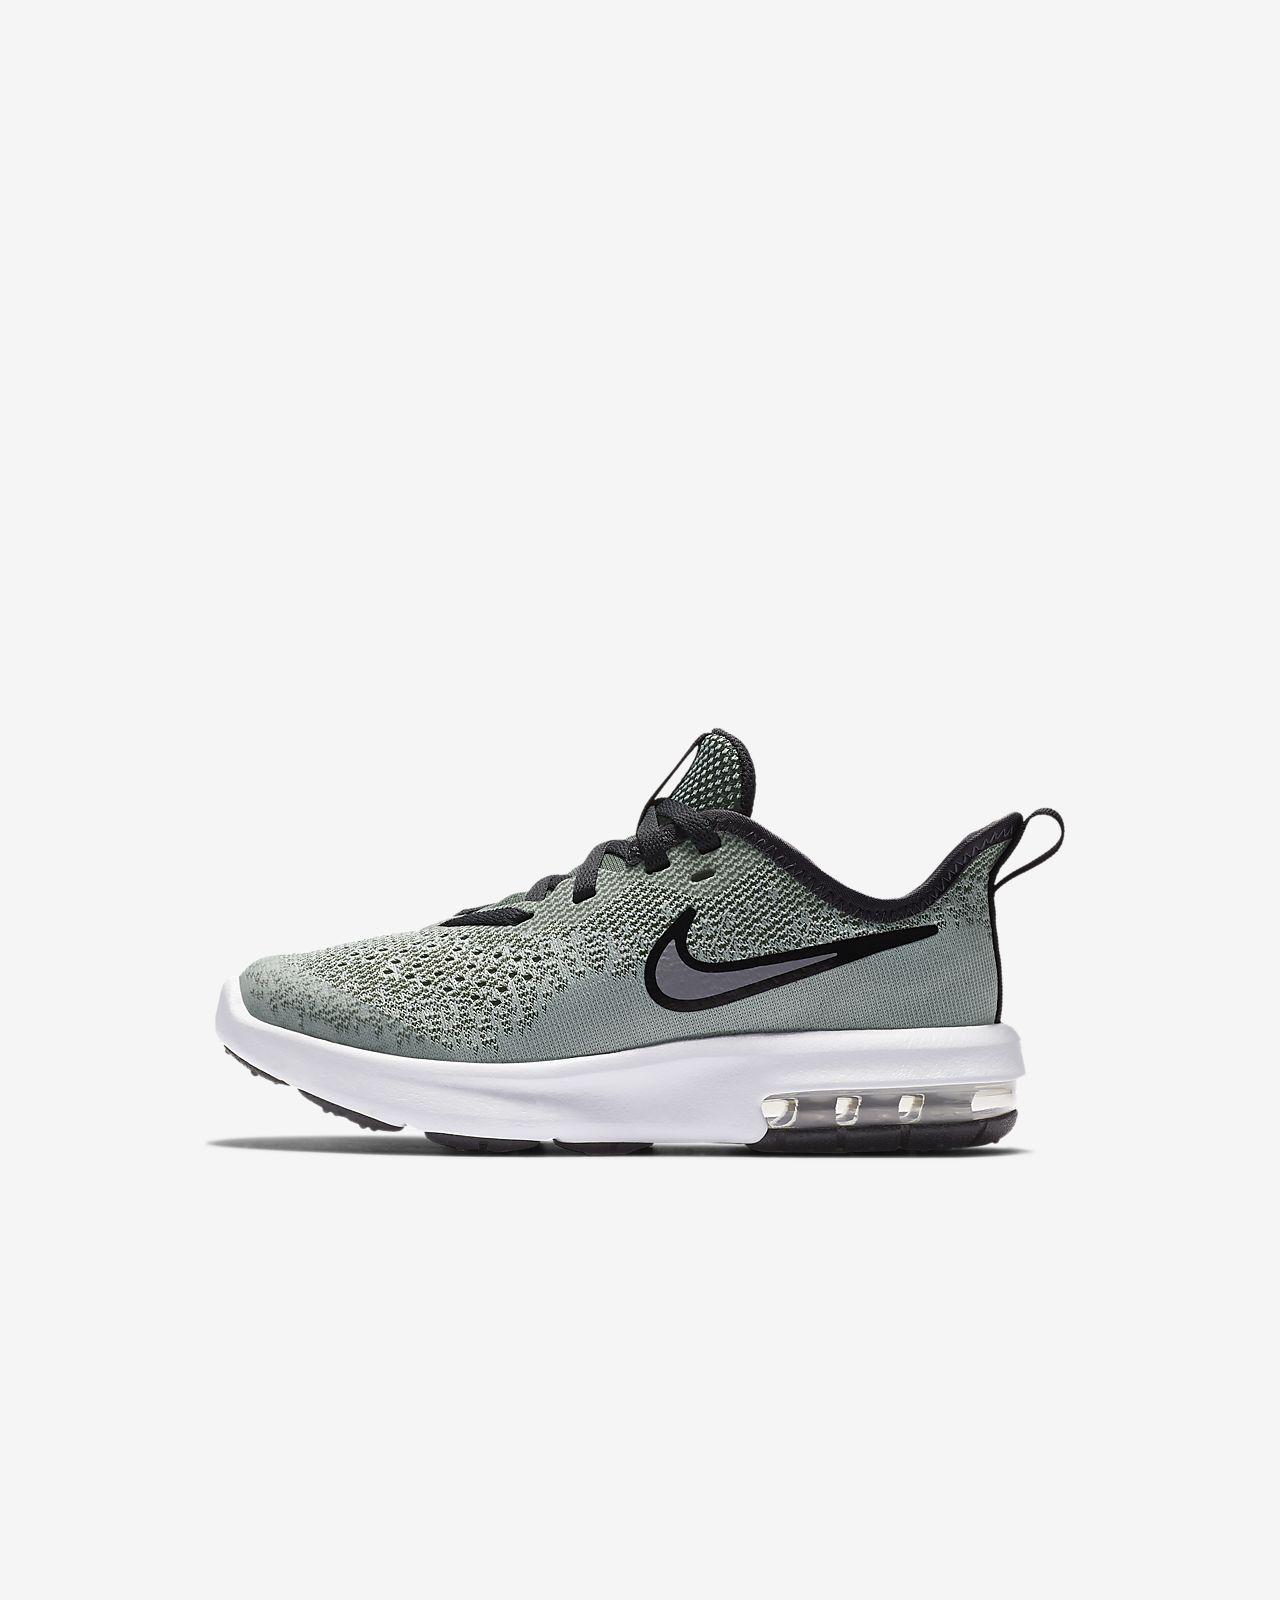 Nike Air Max Sequent 4 cipő gyerekeknek